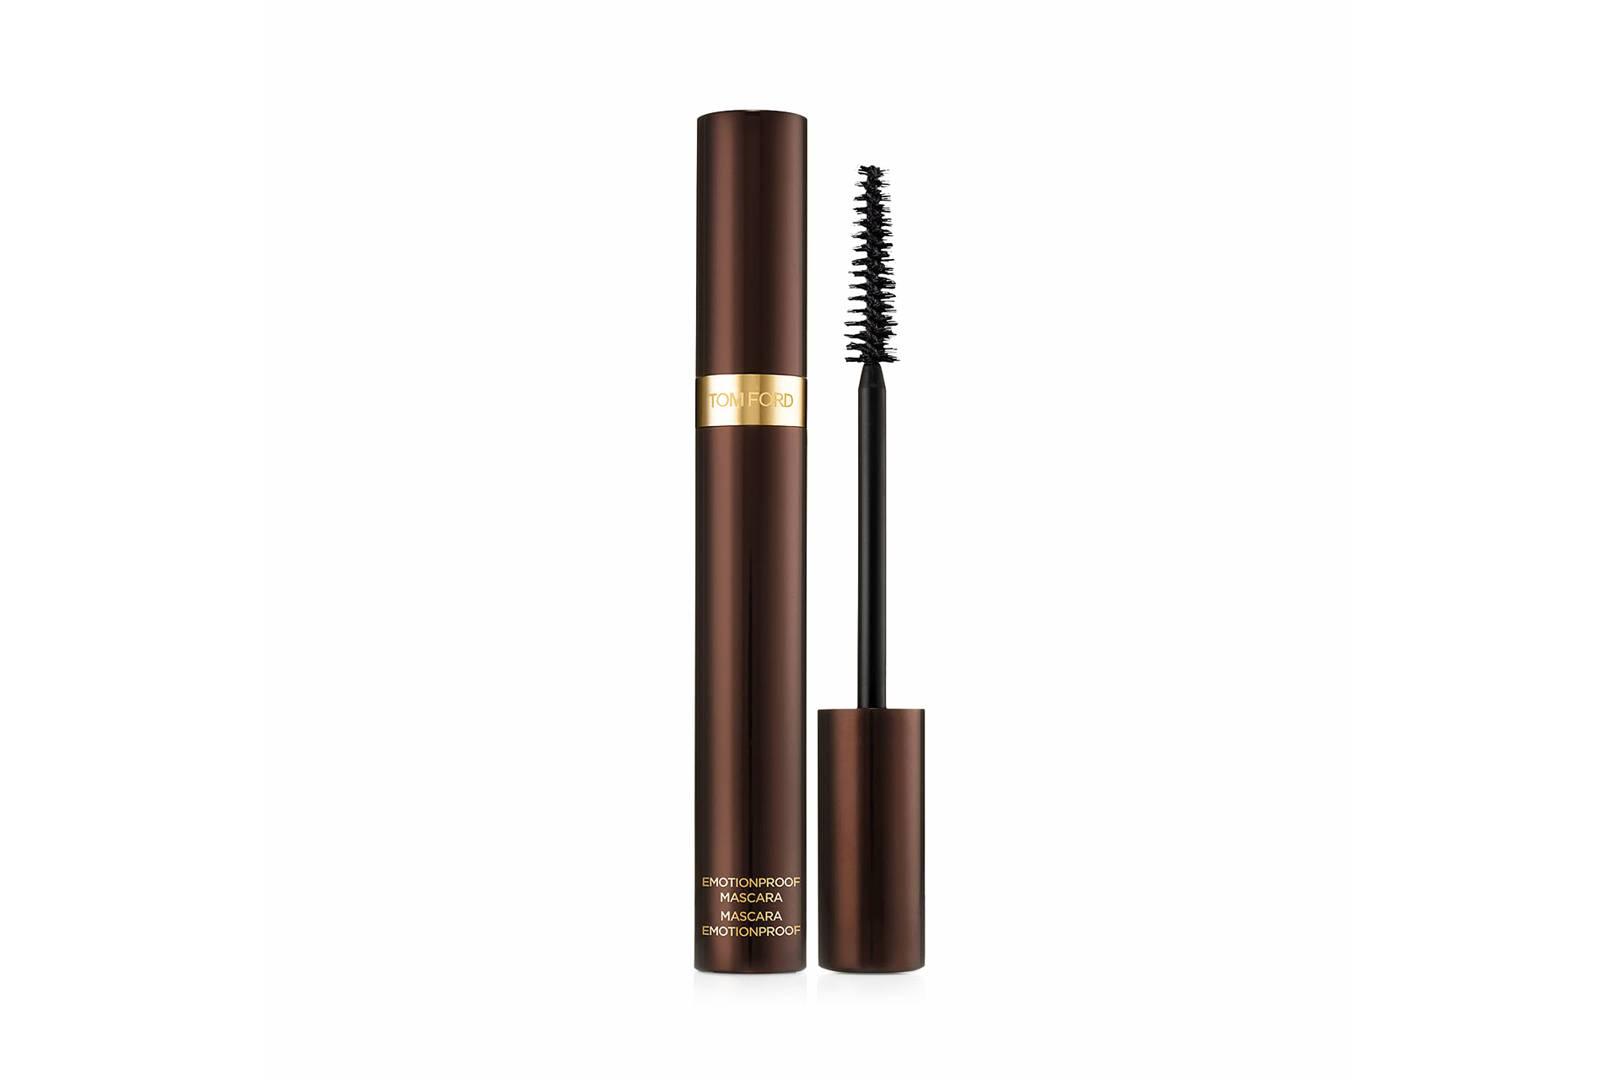 00c318613f1 Best Waterproof Mascara: Eye Makeup That Doesn't Smudge | Glamour UK